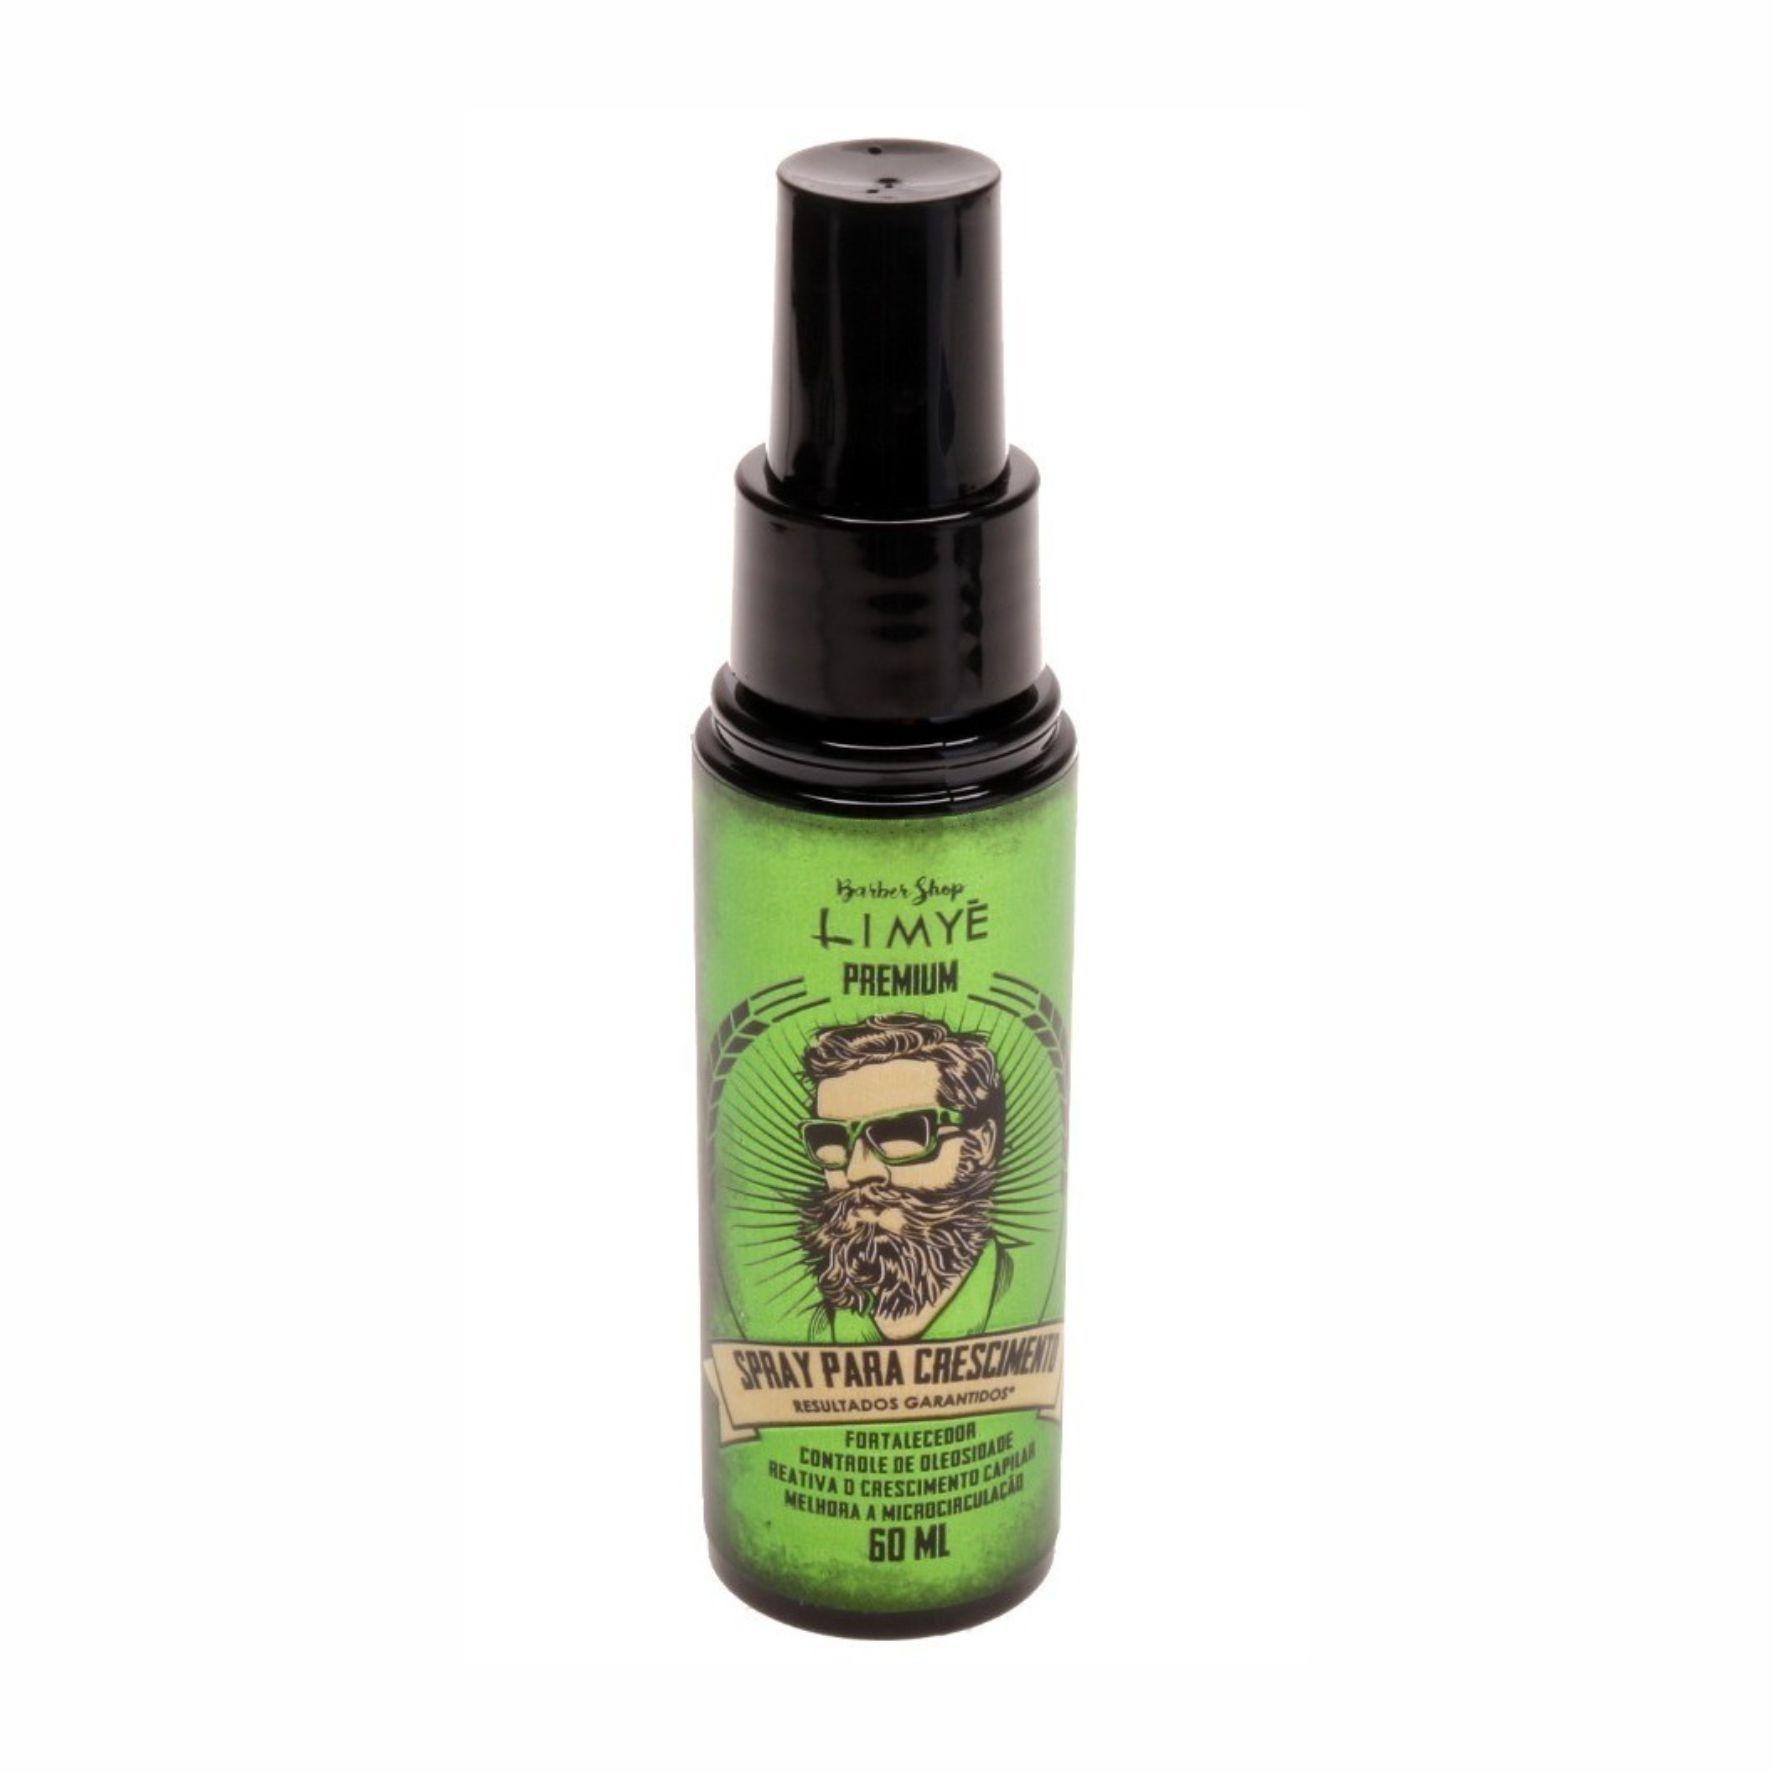 Spray para Crescimento Premium 60ml Limye Brasil